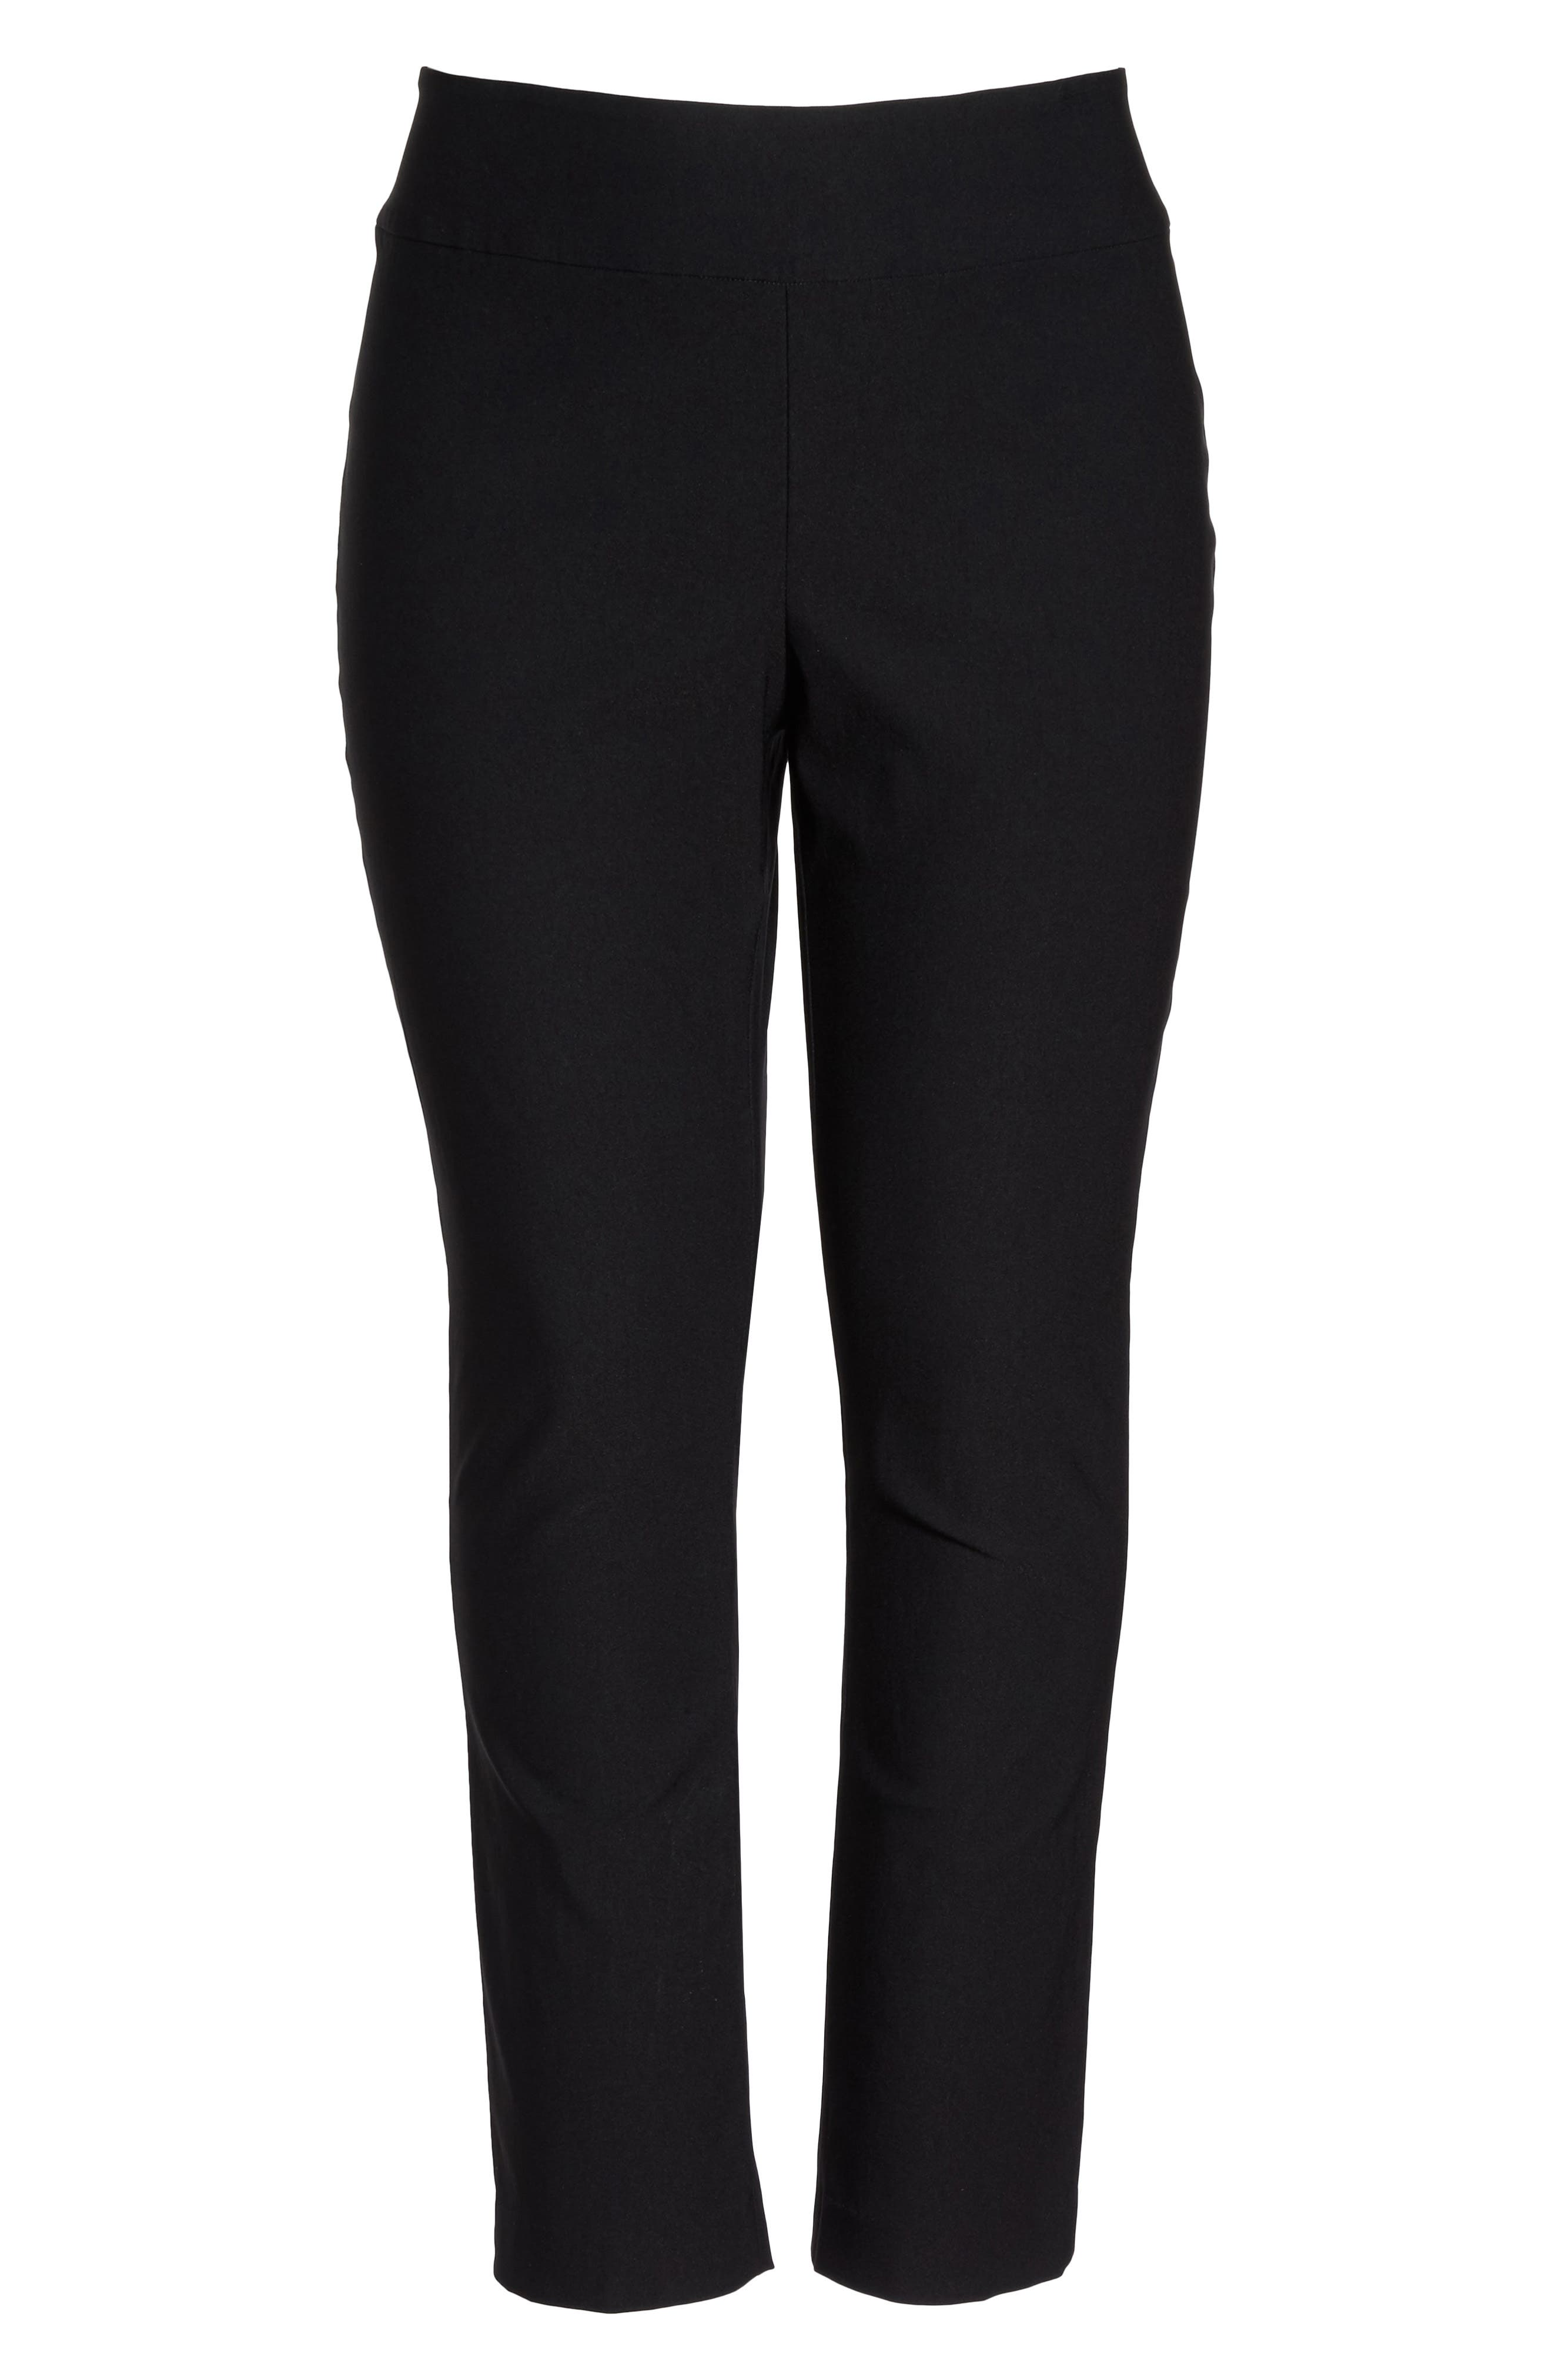 'Wonder Stretch' High Rise Straight Leg Pants,                             Main thumbnail 1, color,                             BLACK ONYX